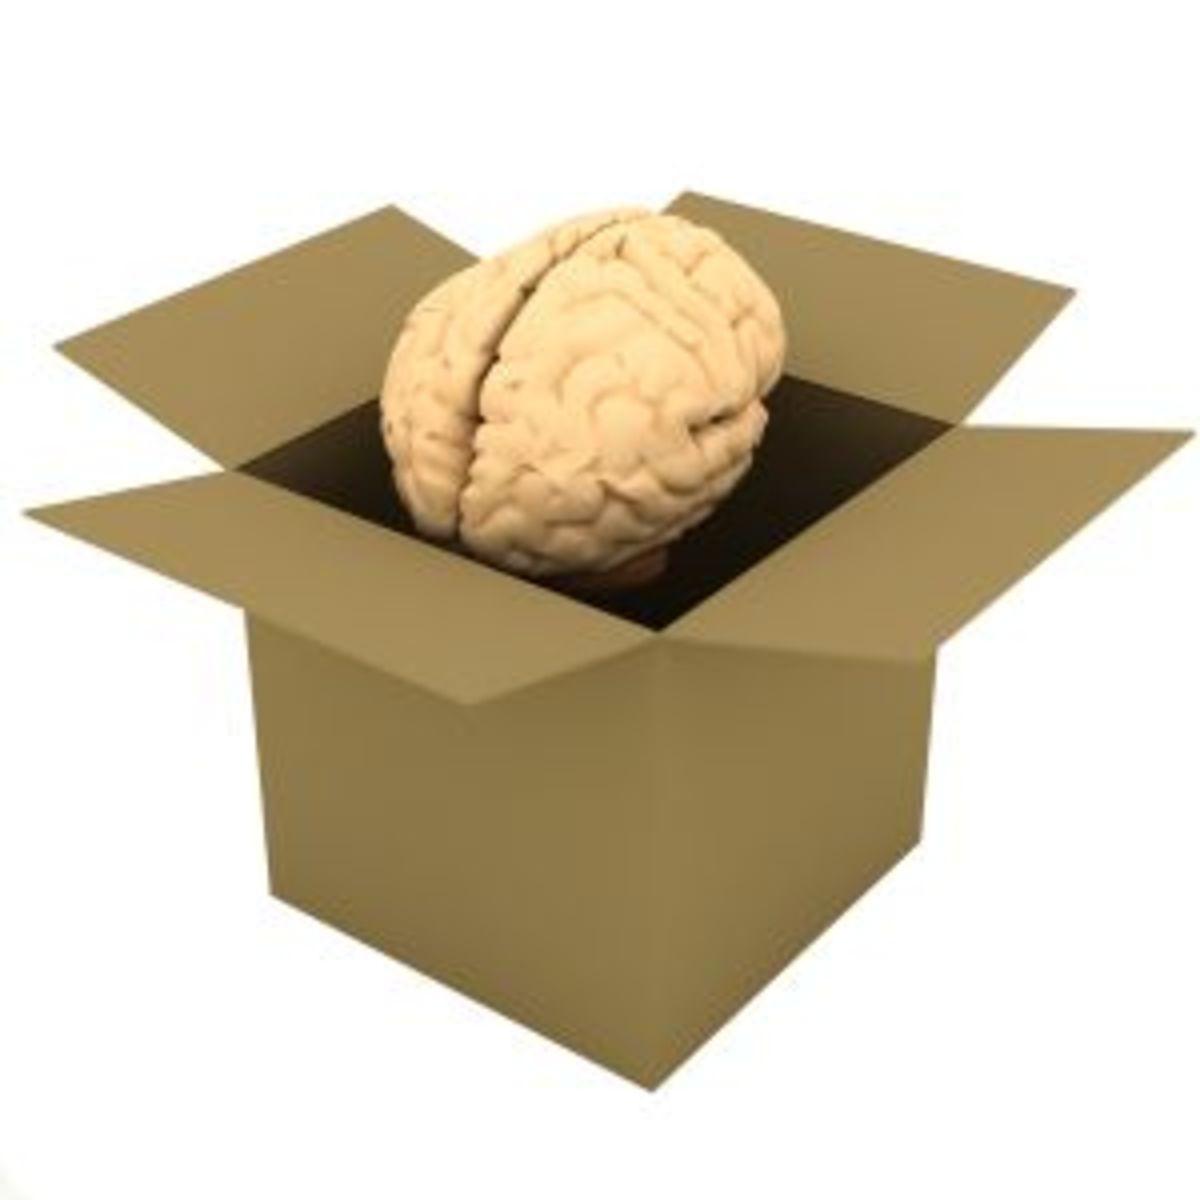 Alzheimer's Disease: Demographics, Risk Factors and Treatments